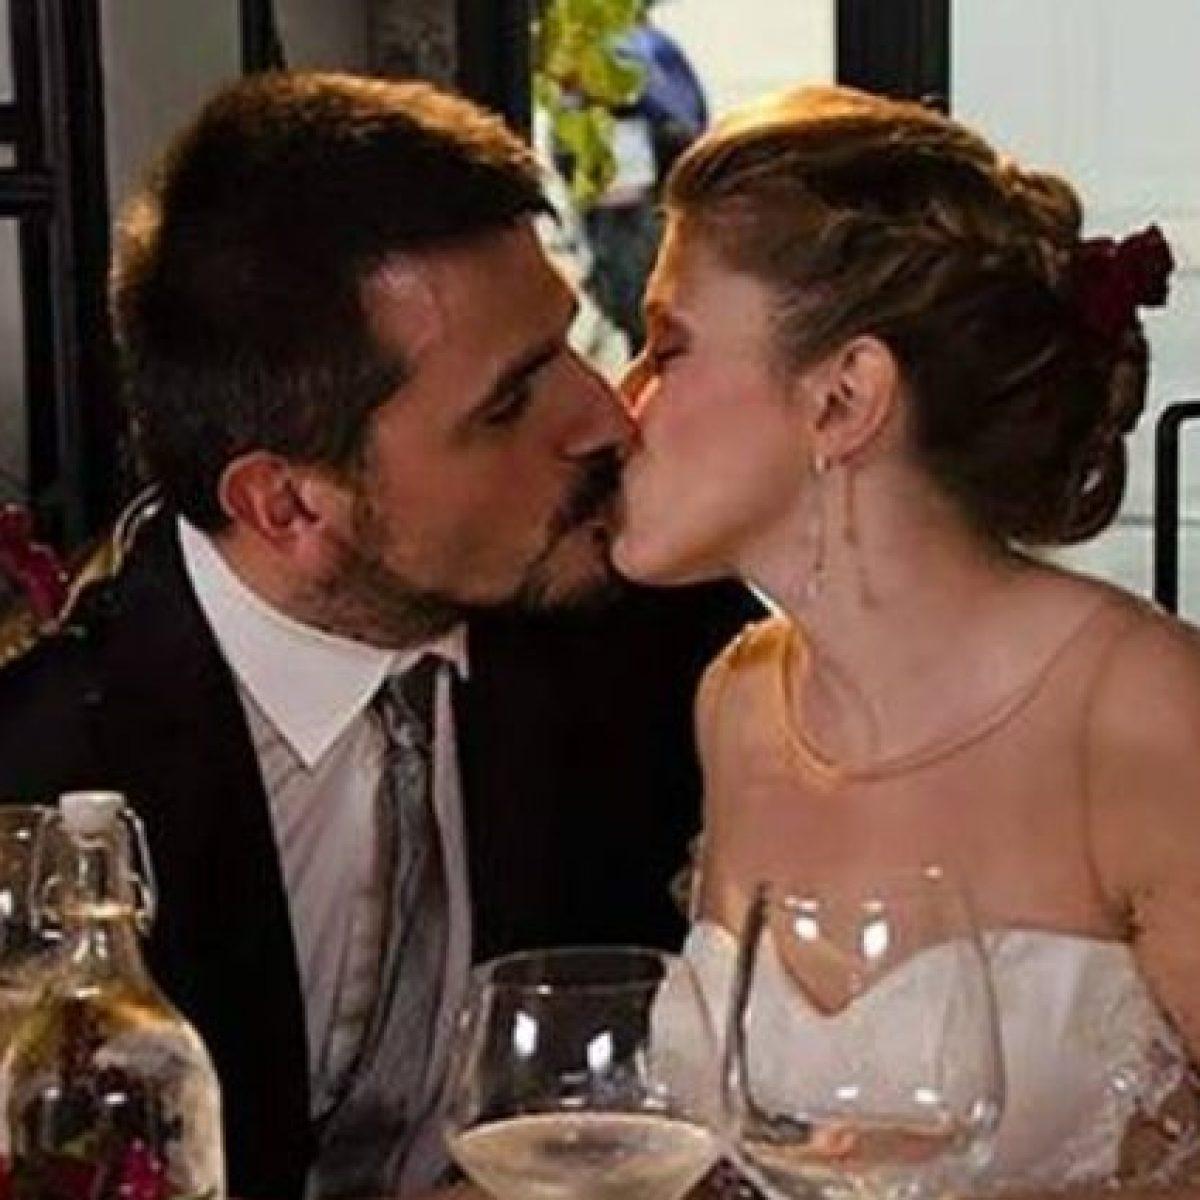 Matrimonio In Prima Vista : Matrimonio a prima vista dago fotogallery